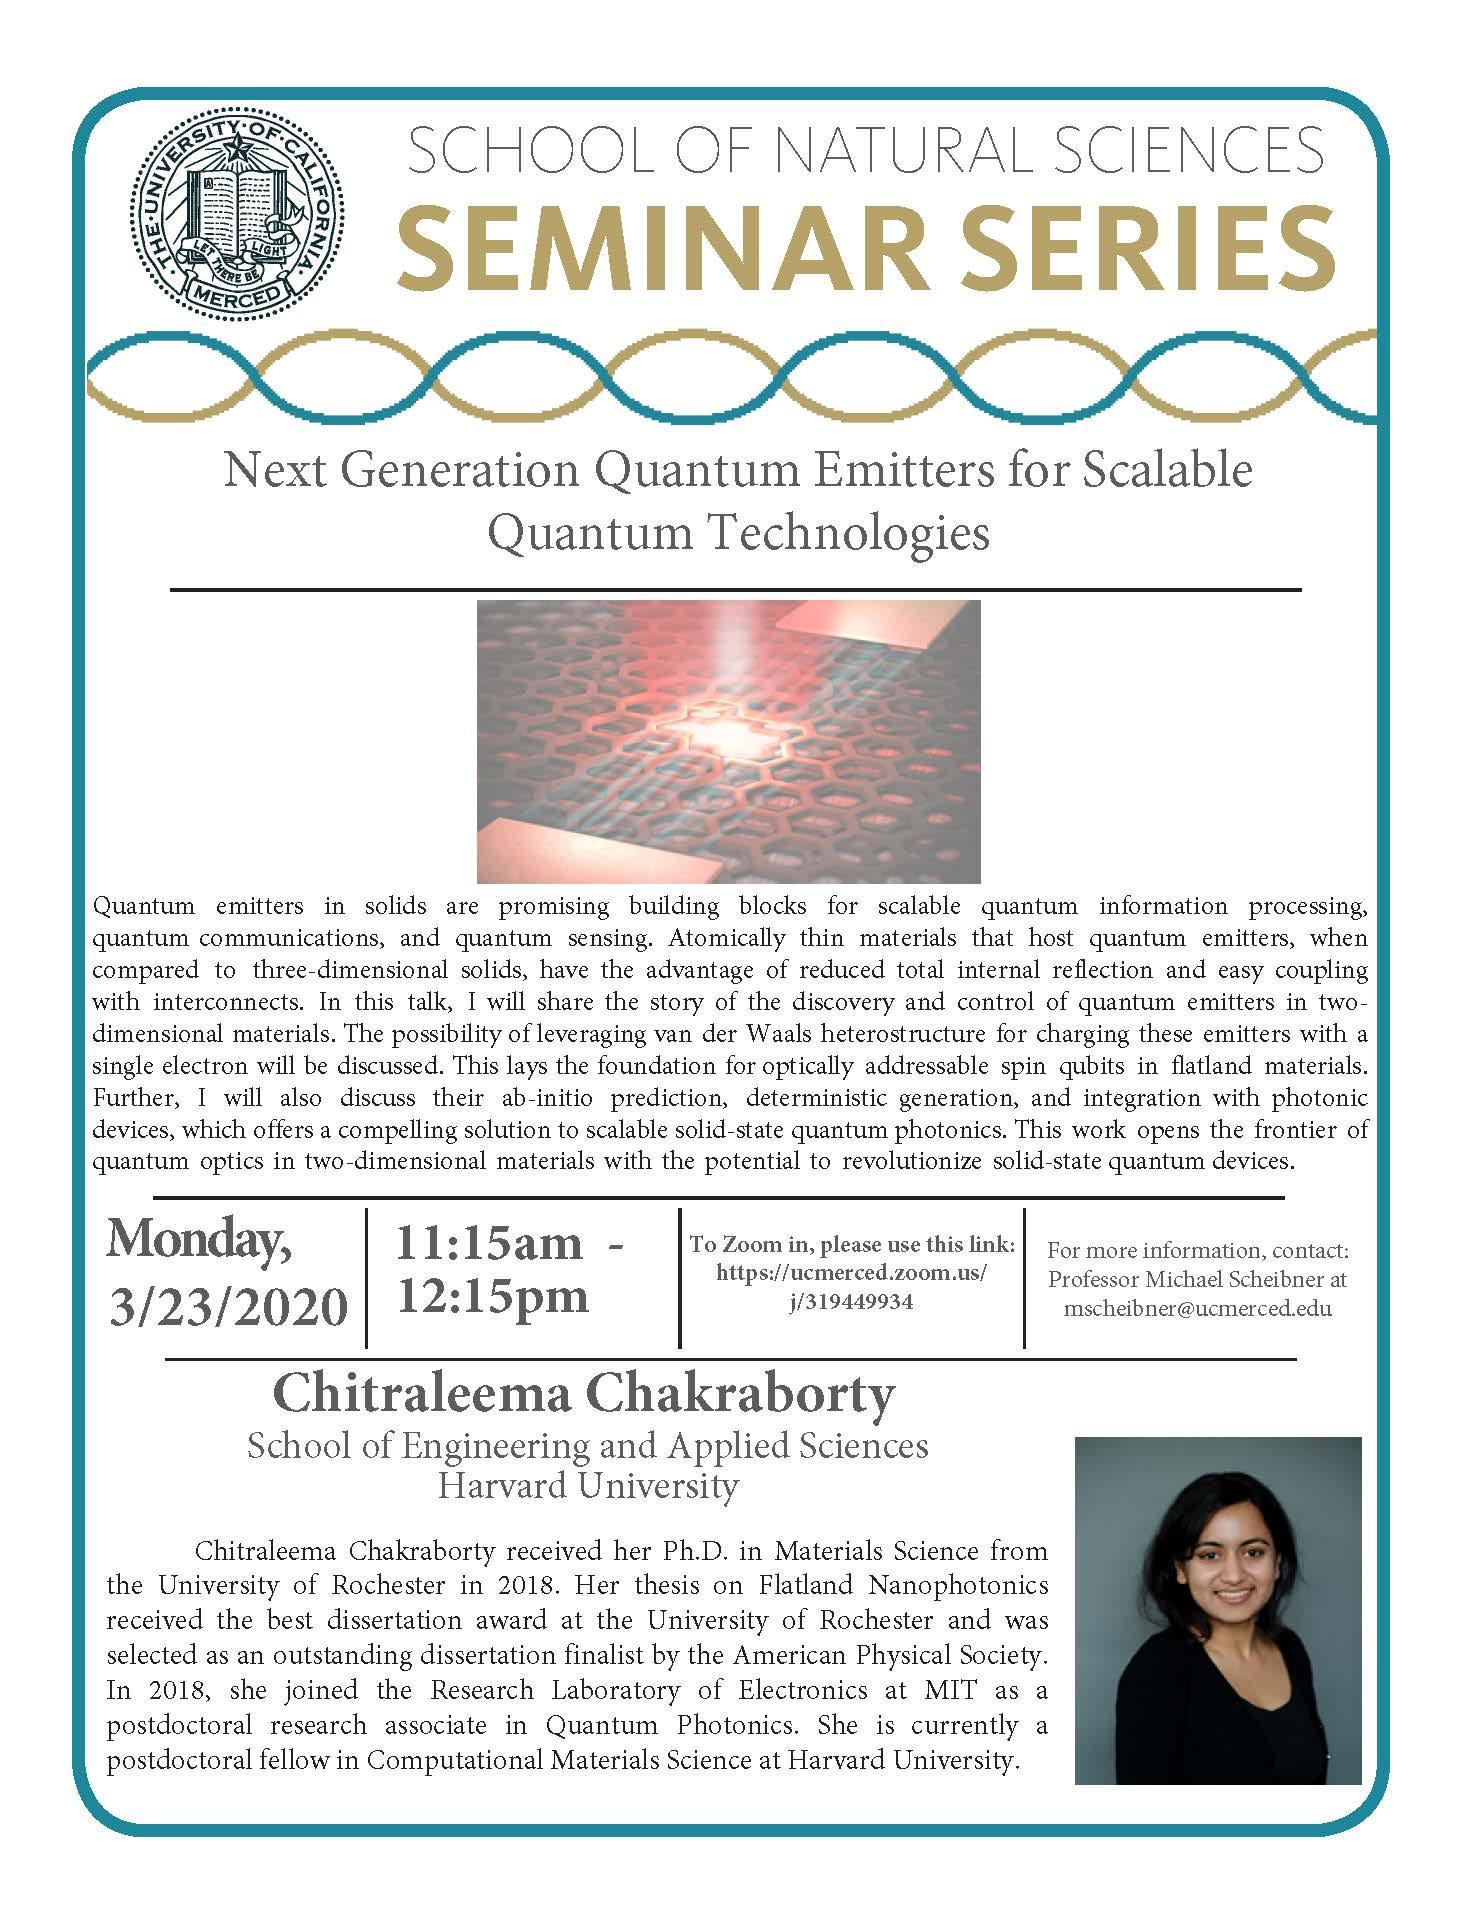 Physics Seminar for Dr. Chitraleema Chakraborty